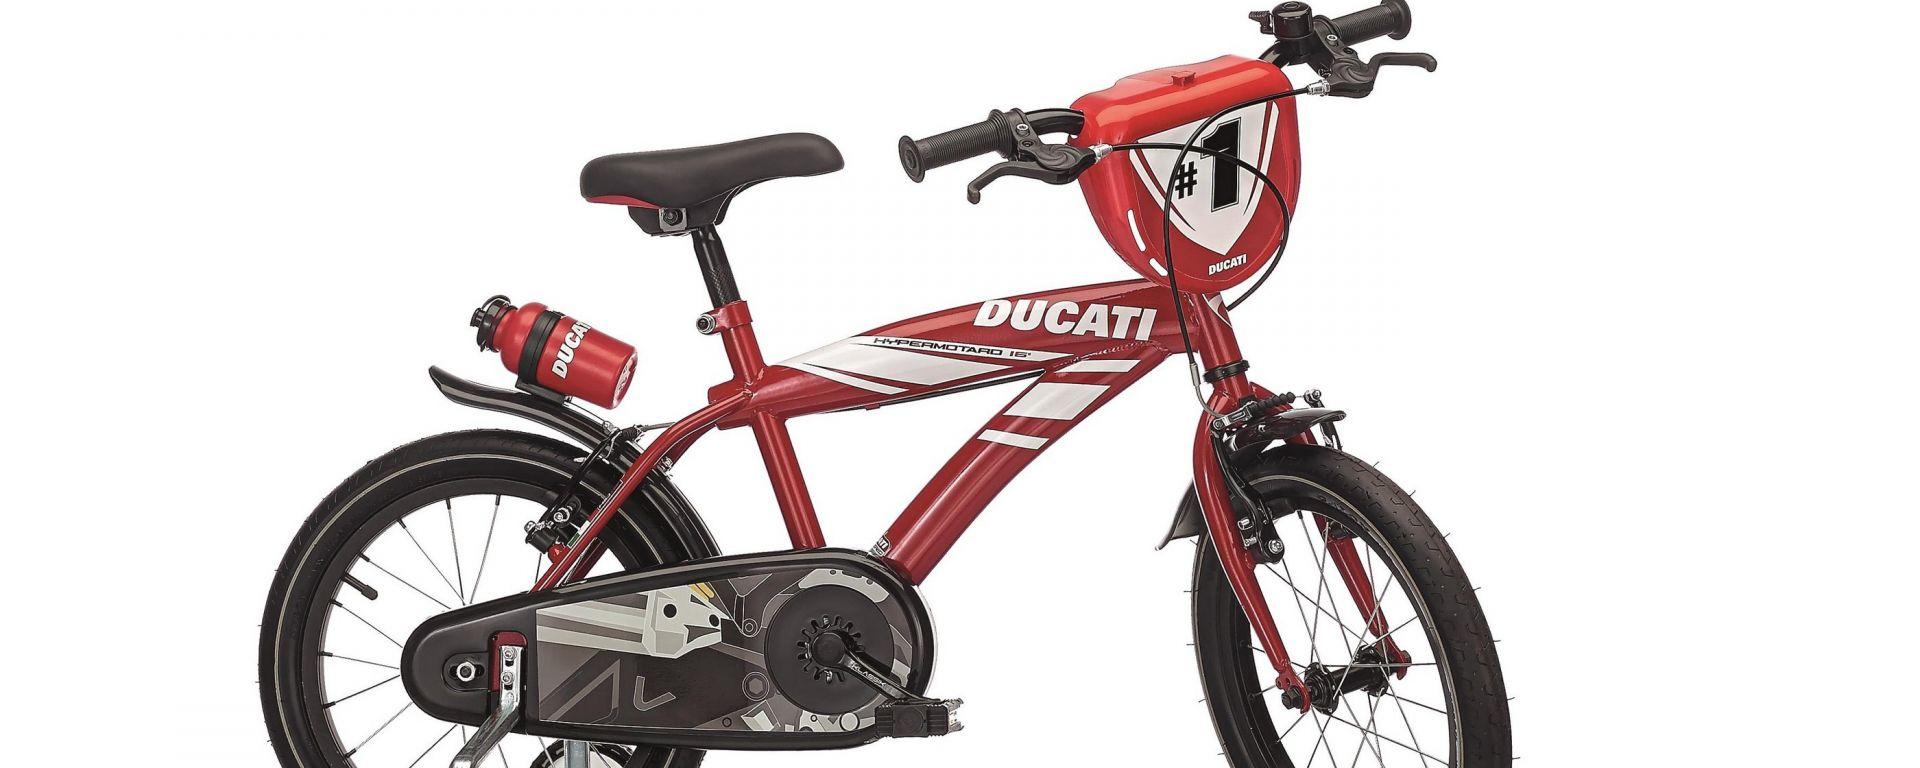 Bianchi-Ducati: la gamma bici 2016